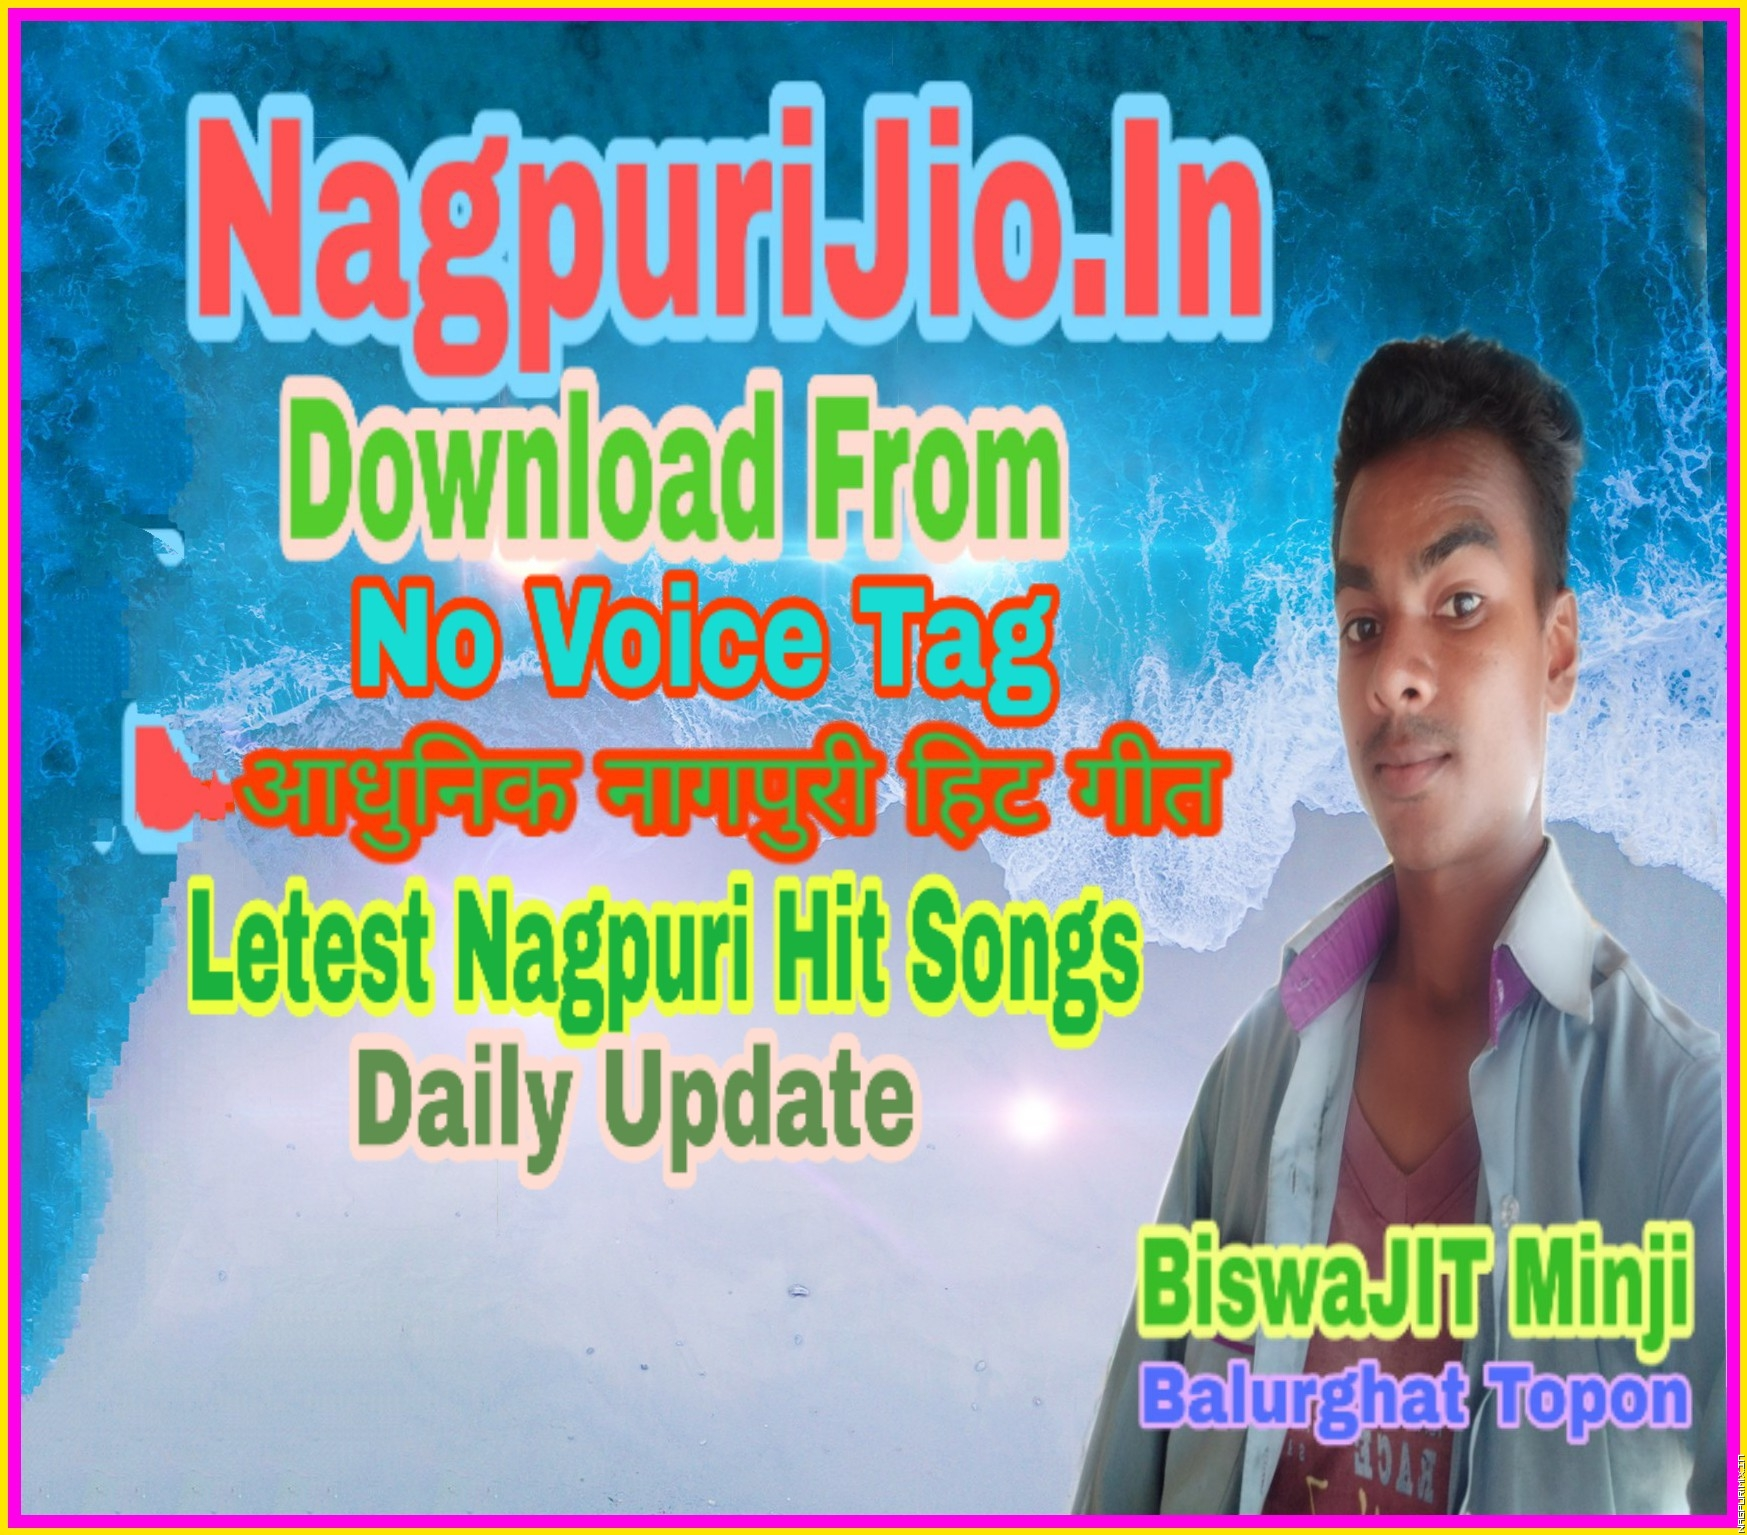 October Months Latest Nagpuri Songs